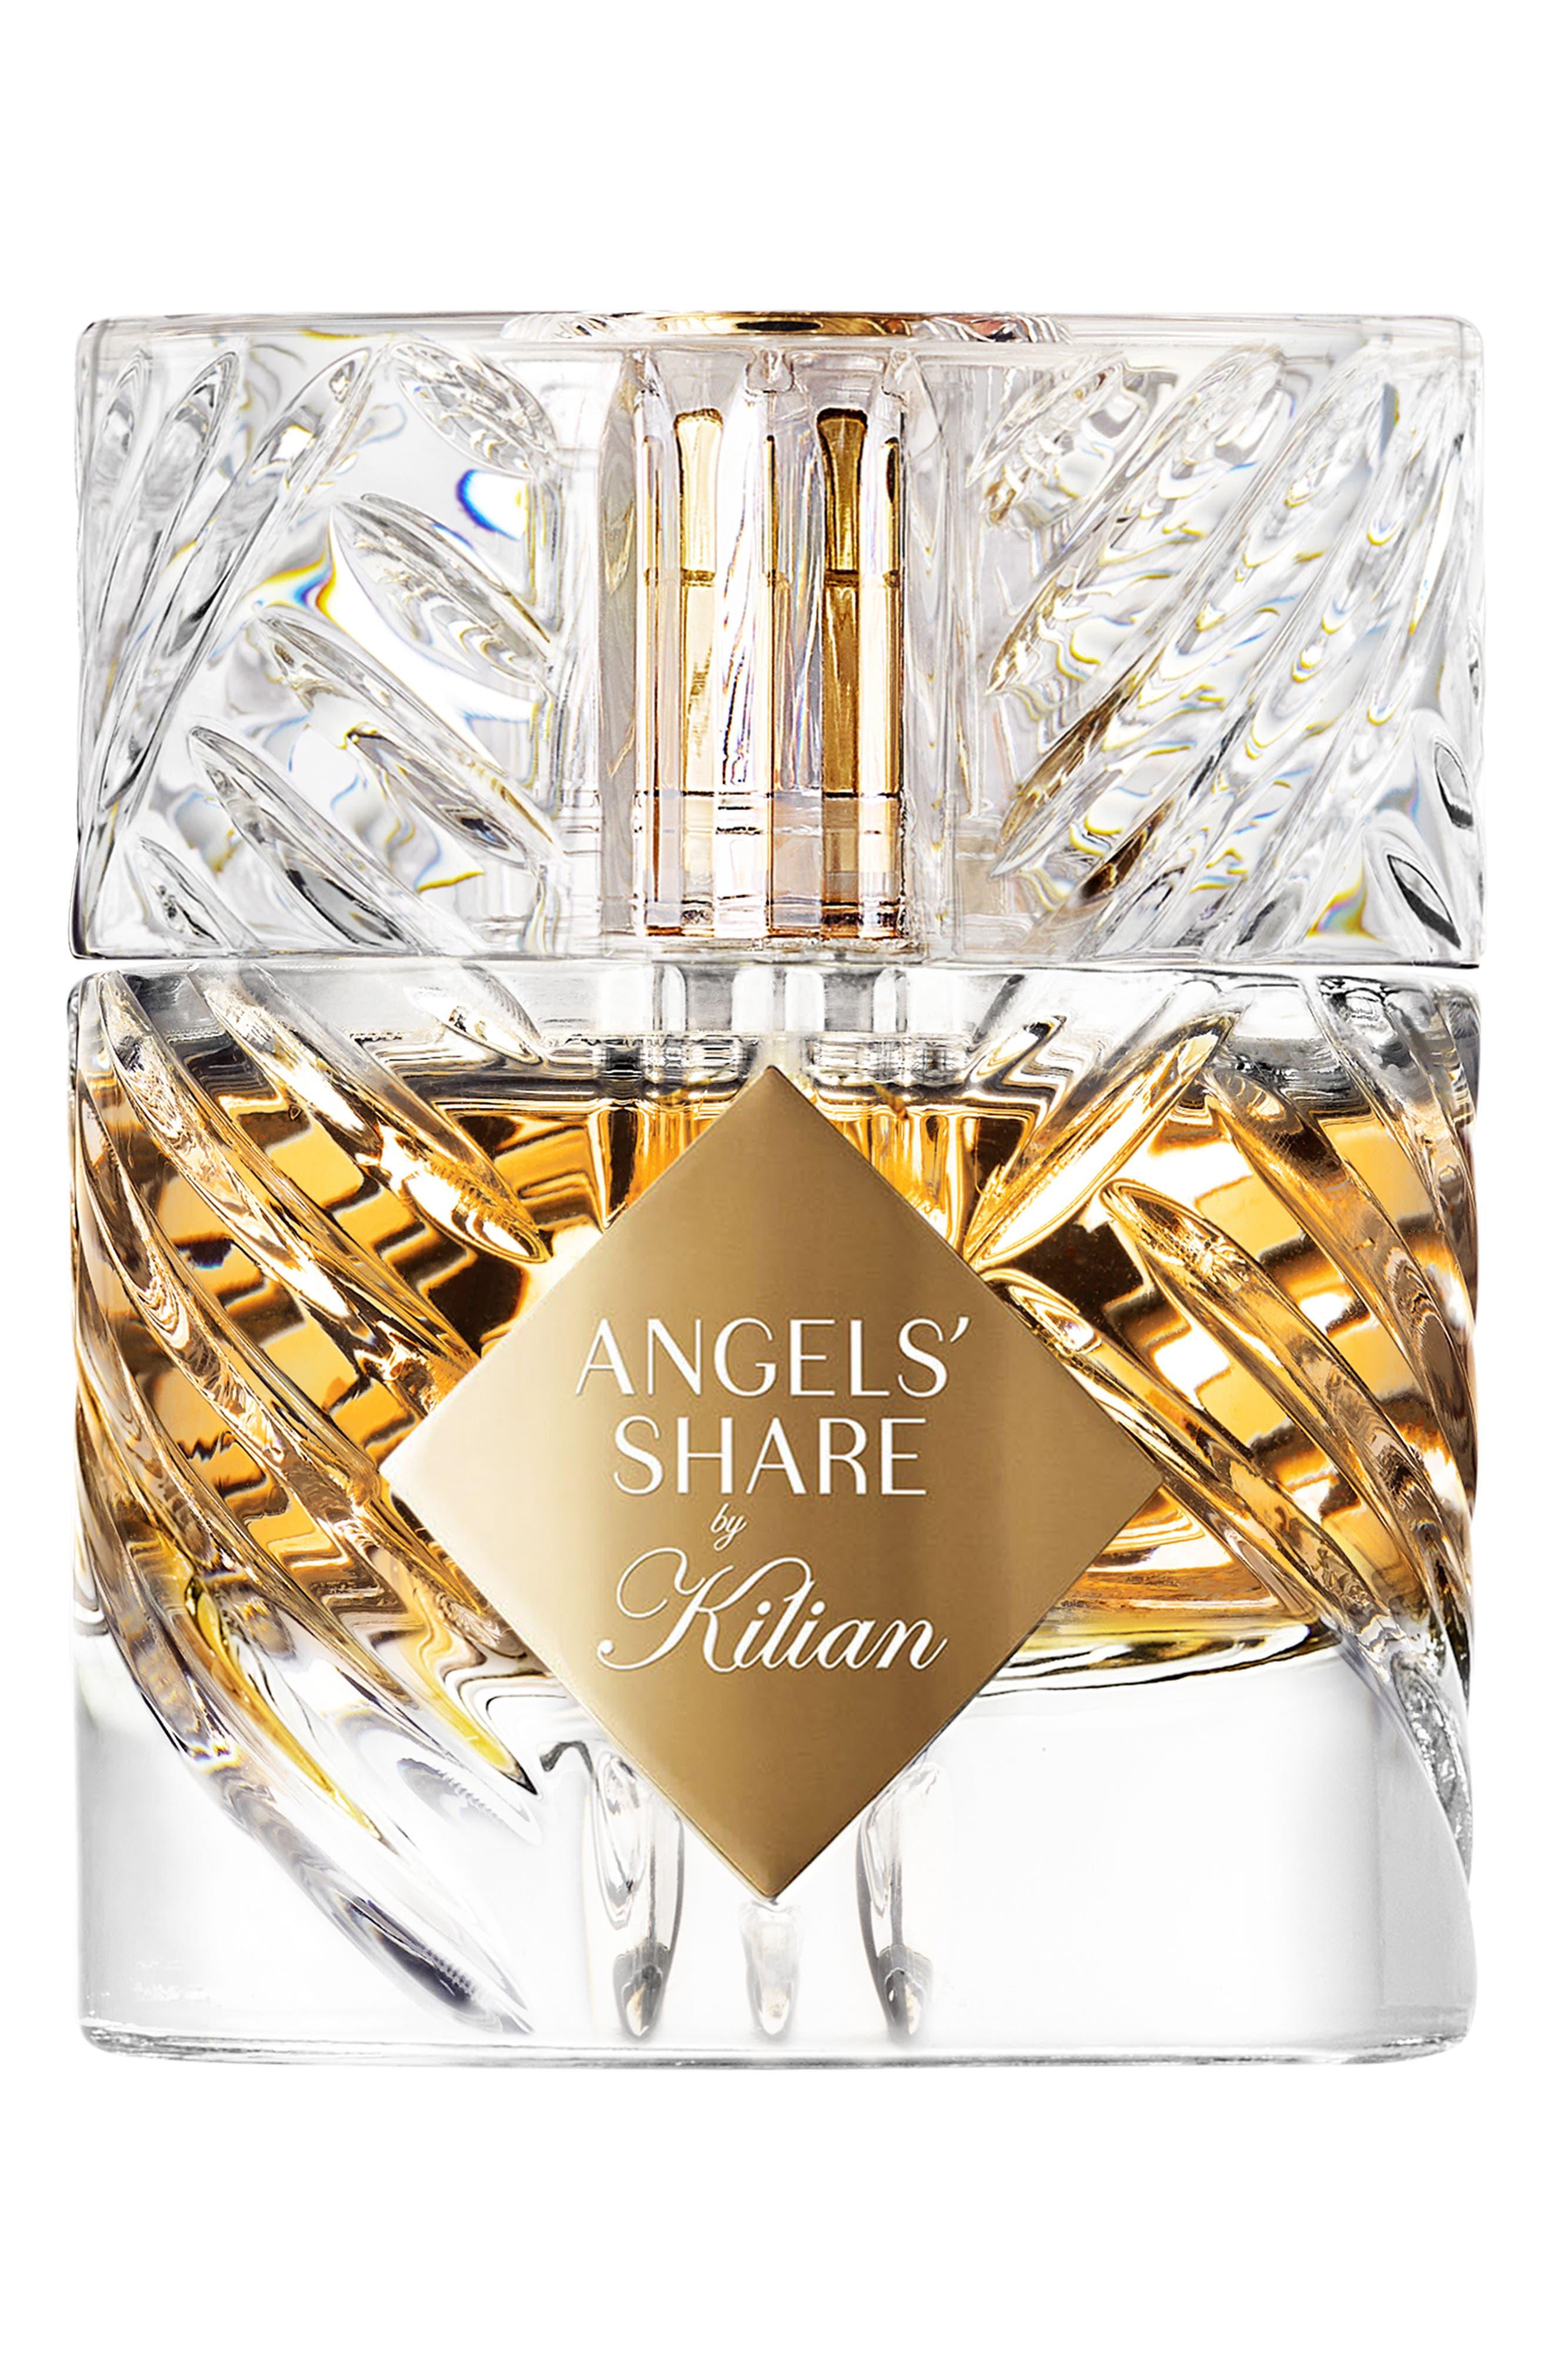 Kilian Liquors Angels' Share Fragrance